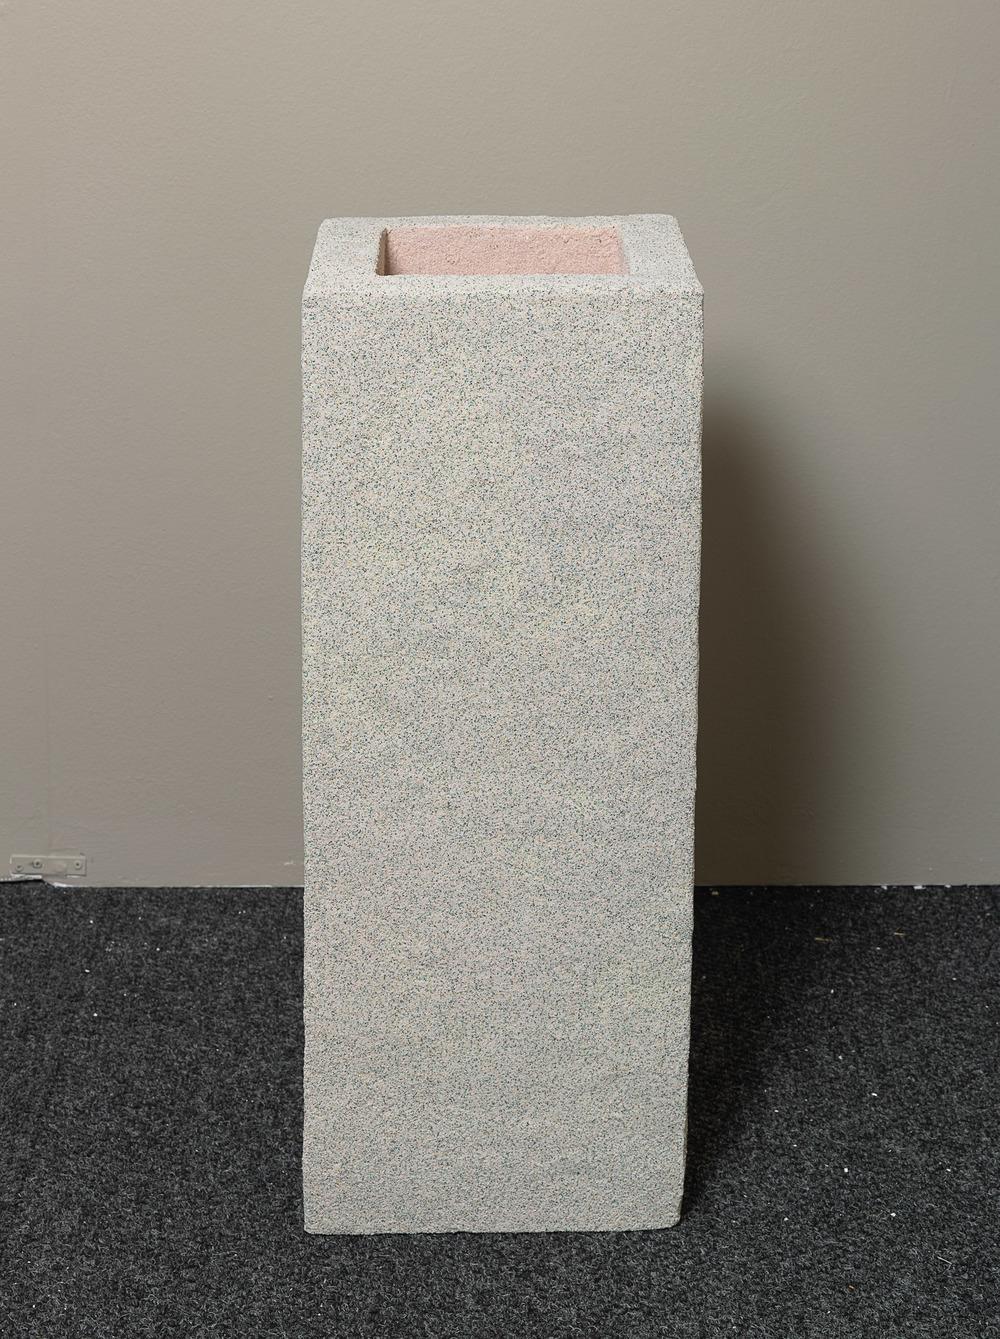 Rachel Higgins   , Organizer   , 2015  , Polystyrene, fiberglass, cement, cerastone  , 34 x 12 x 12.5 in.